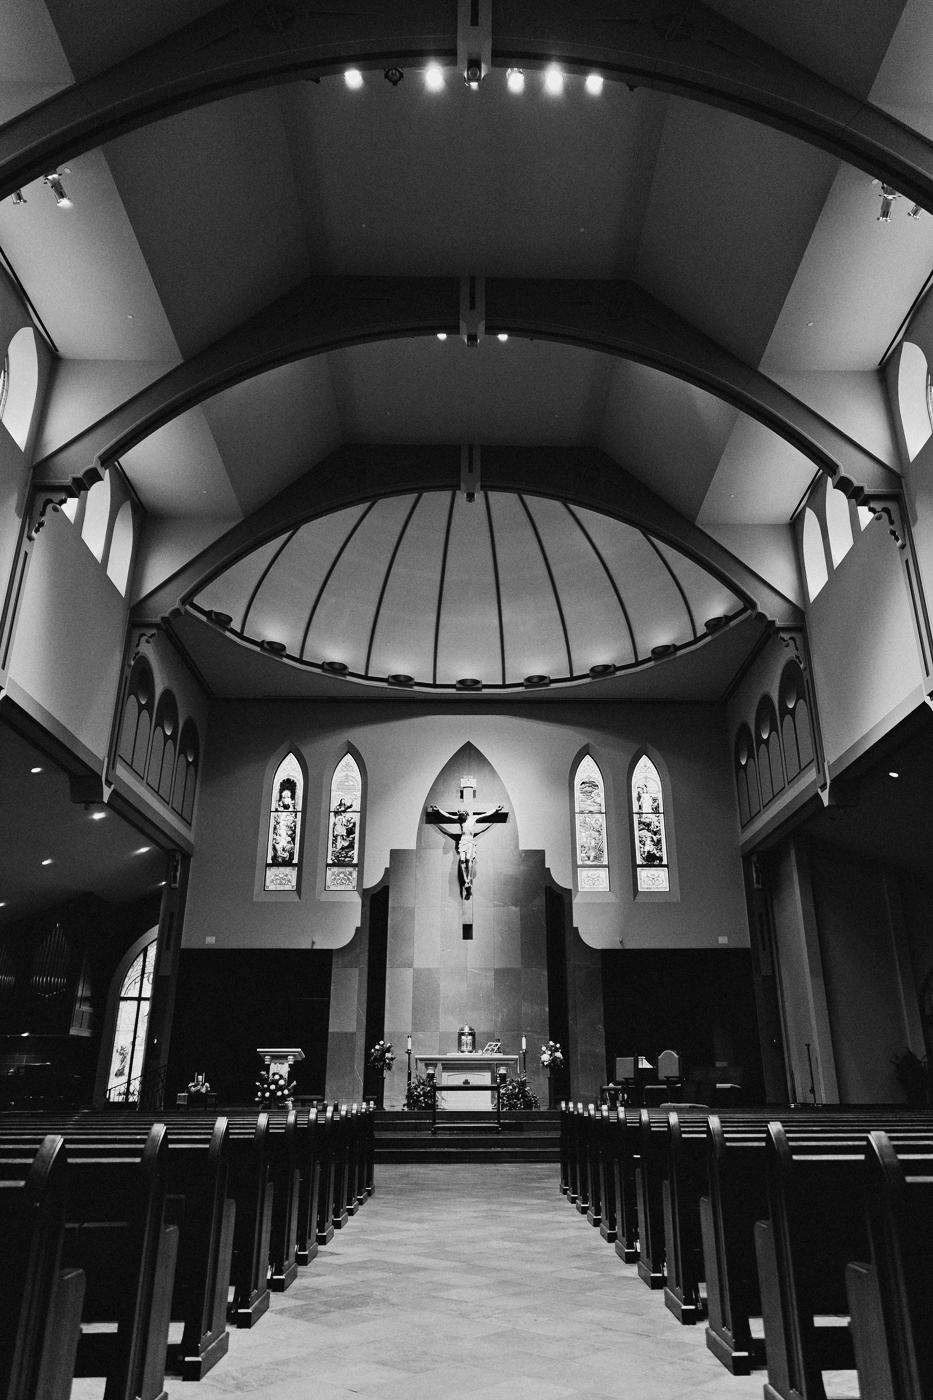 Interior view of St. Michael Catholic Church